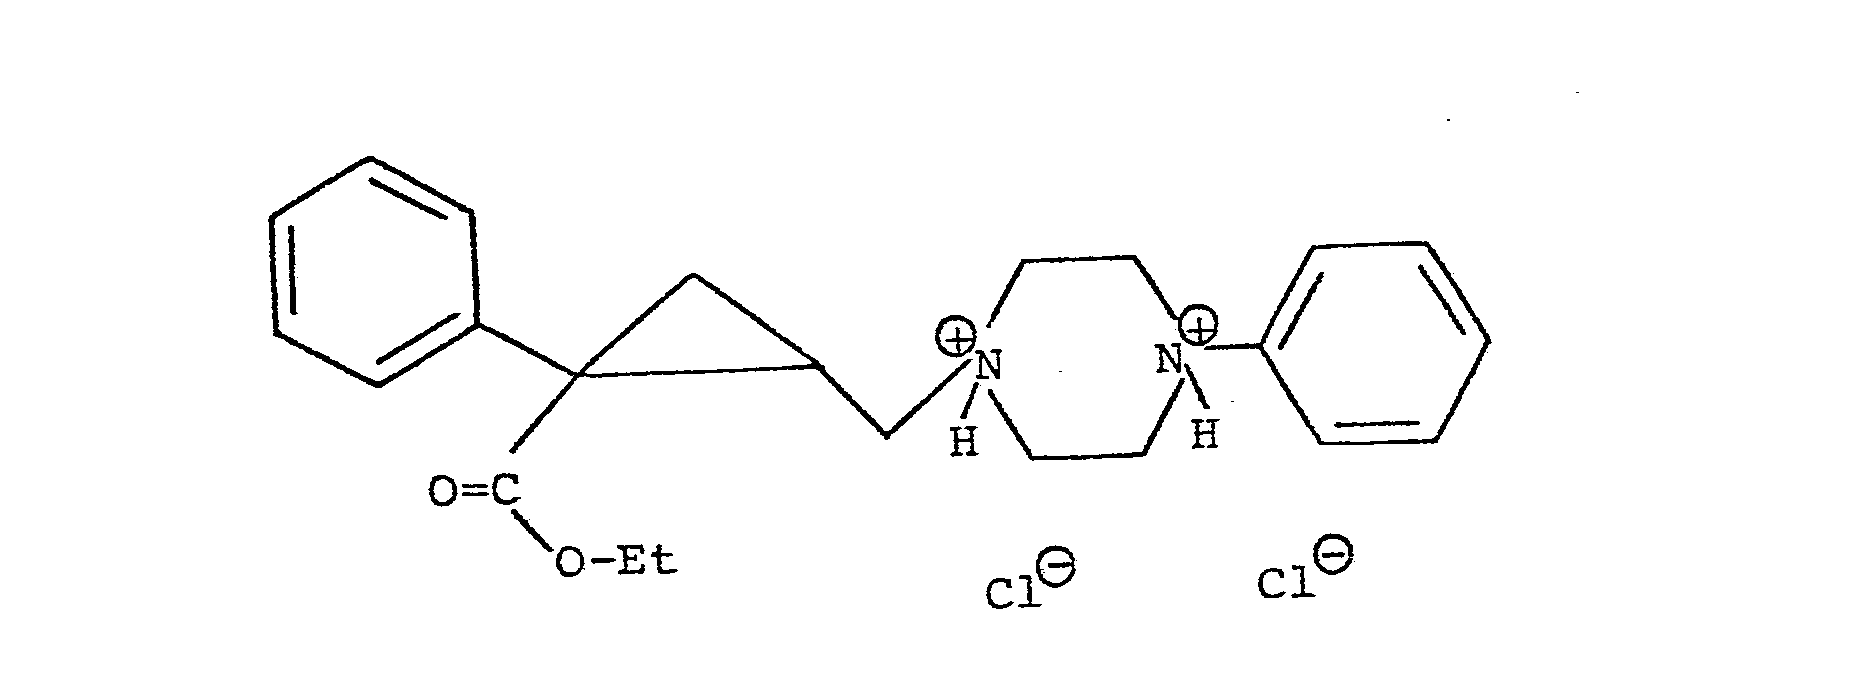 Patent EP0068998A1 - (Z)-1-aryl-2-aminomethyl-cyclopropane